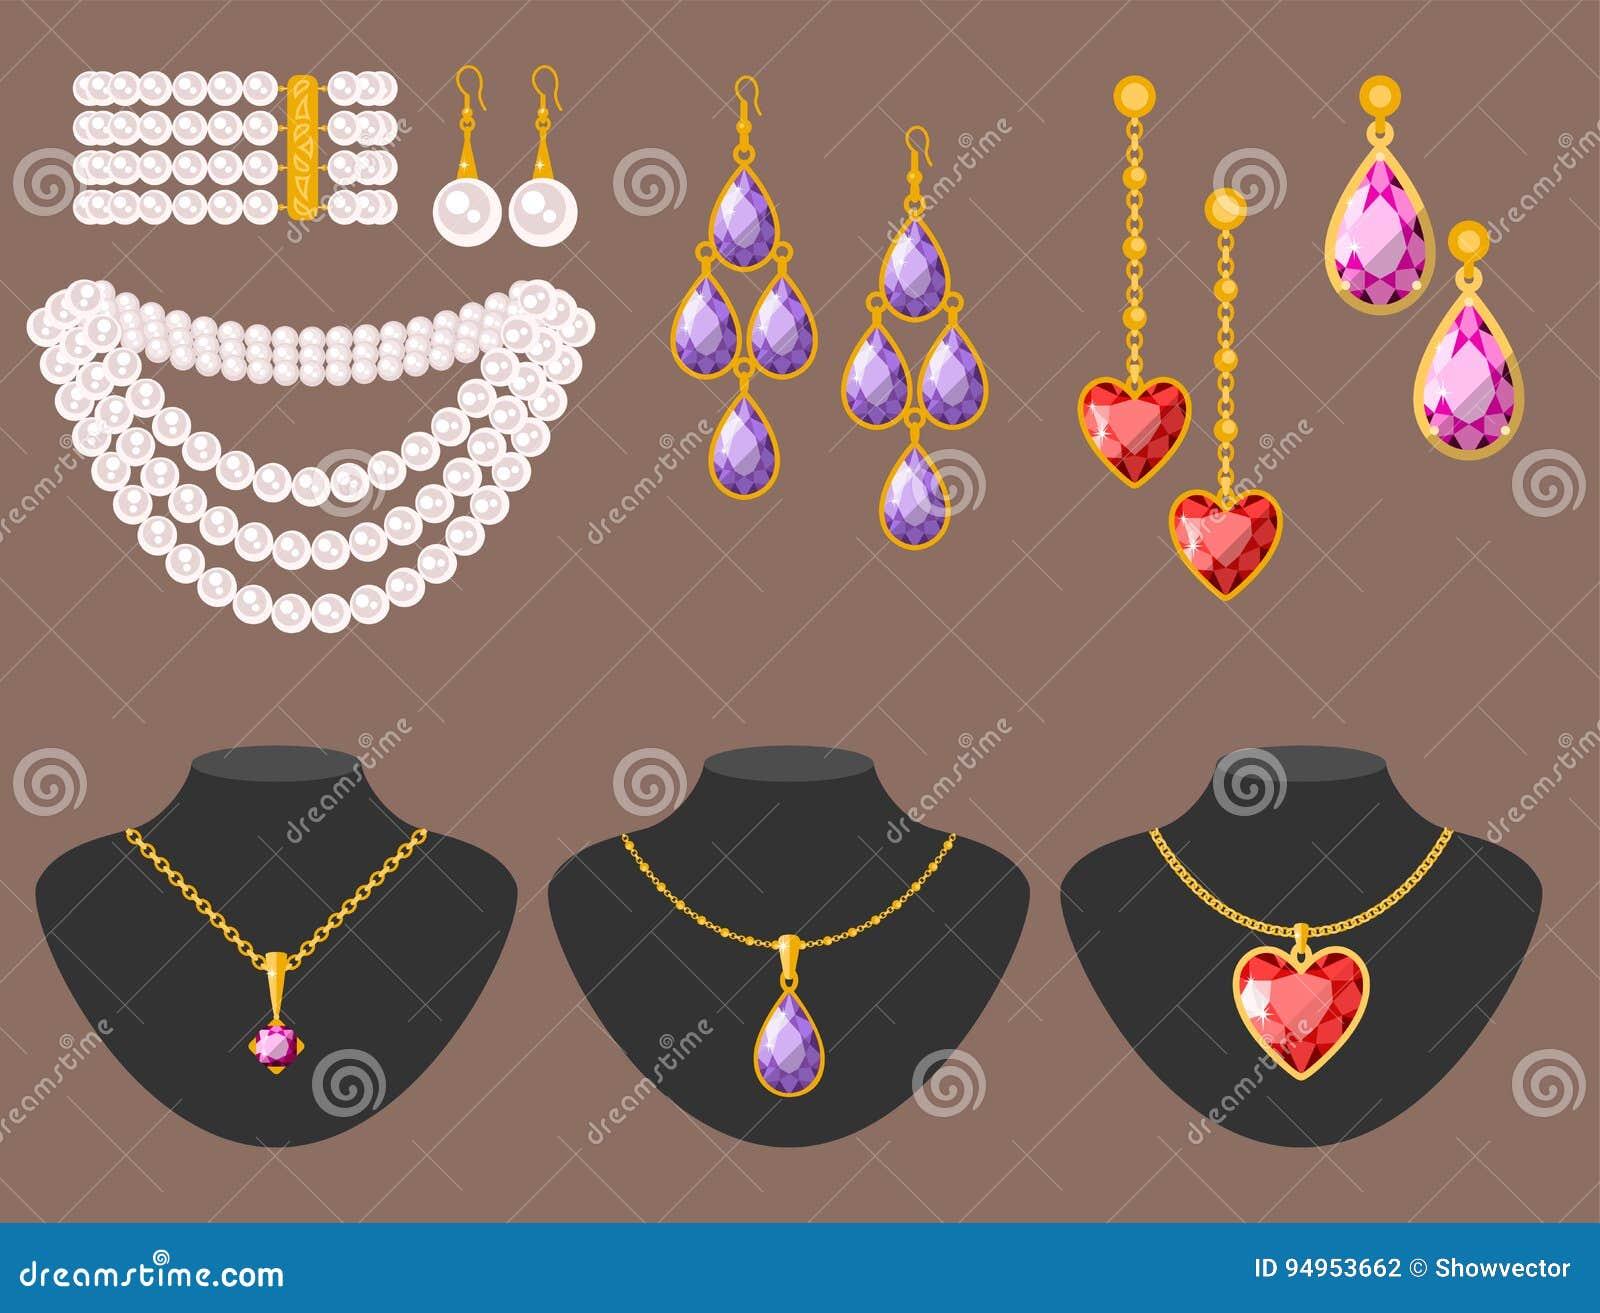 Jewelry Clip Art - Royalty Free